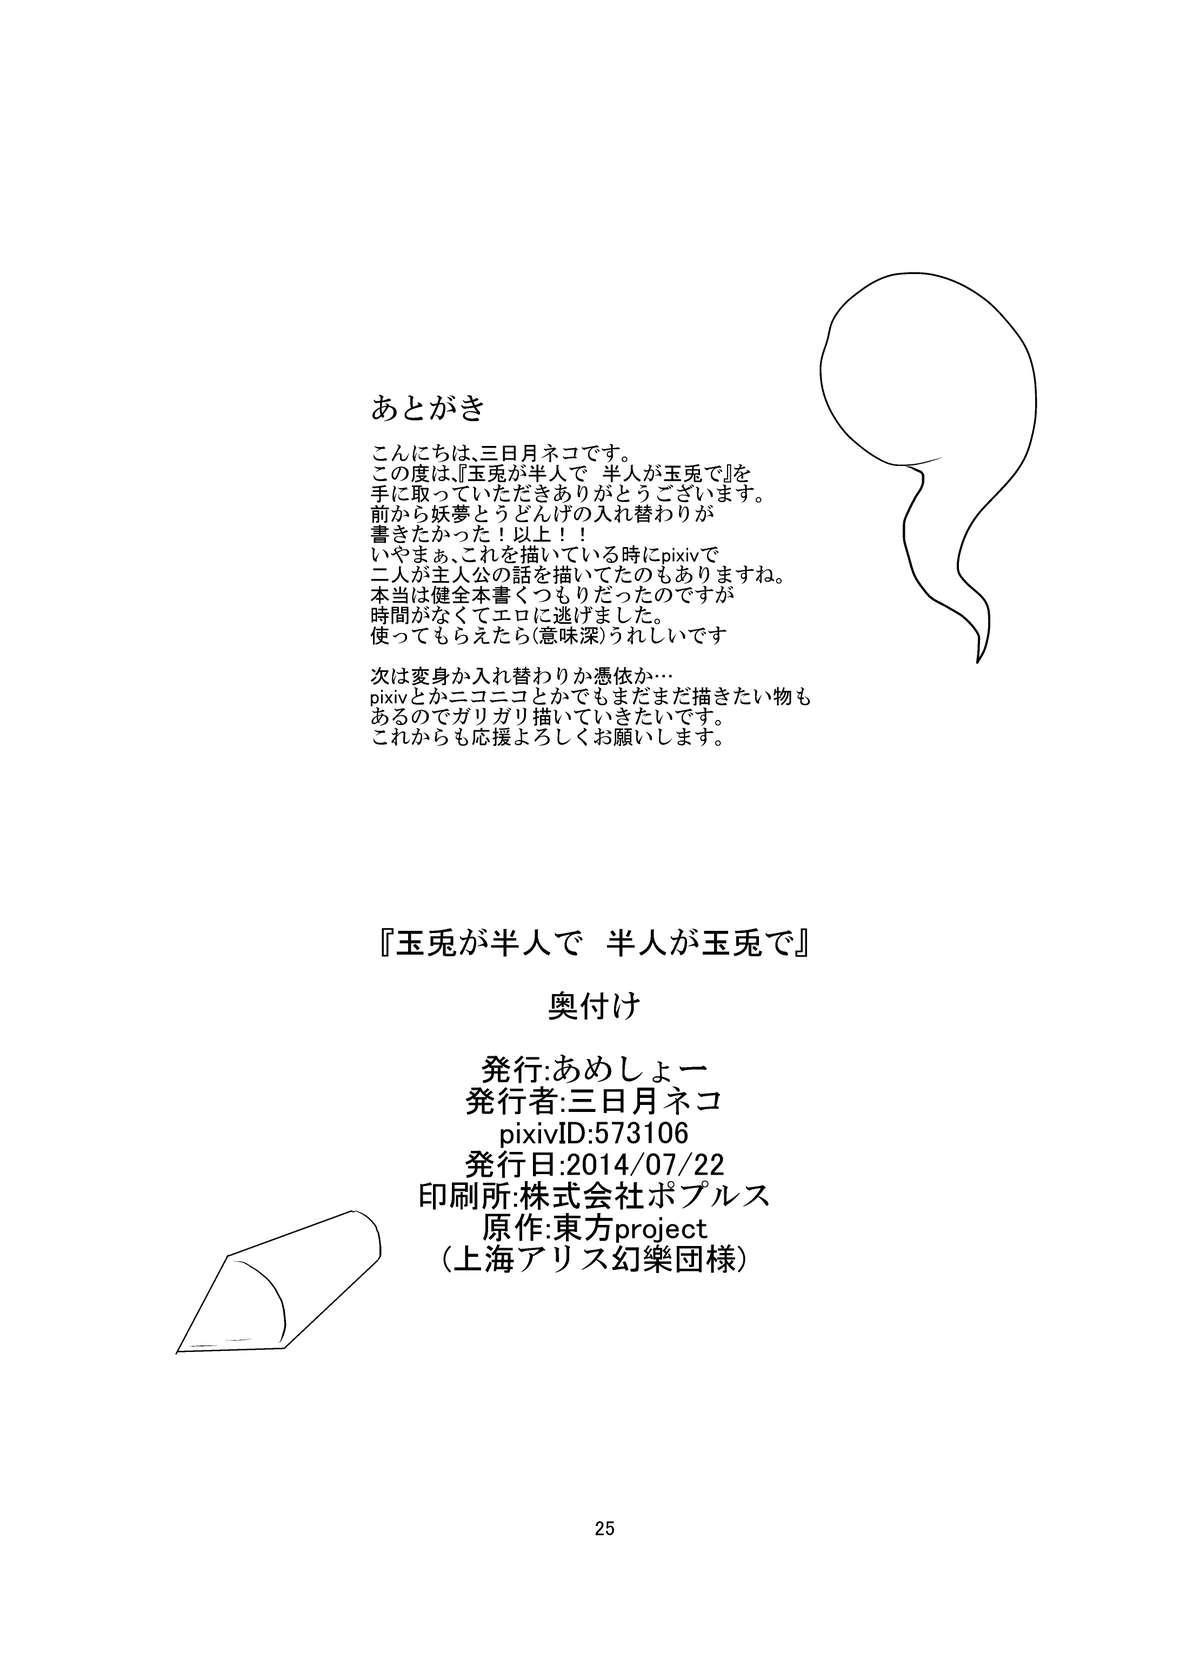 Gyokuto ga Hanjin de Hanjin ga Gyokuto de 24